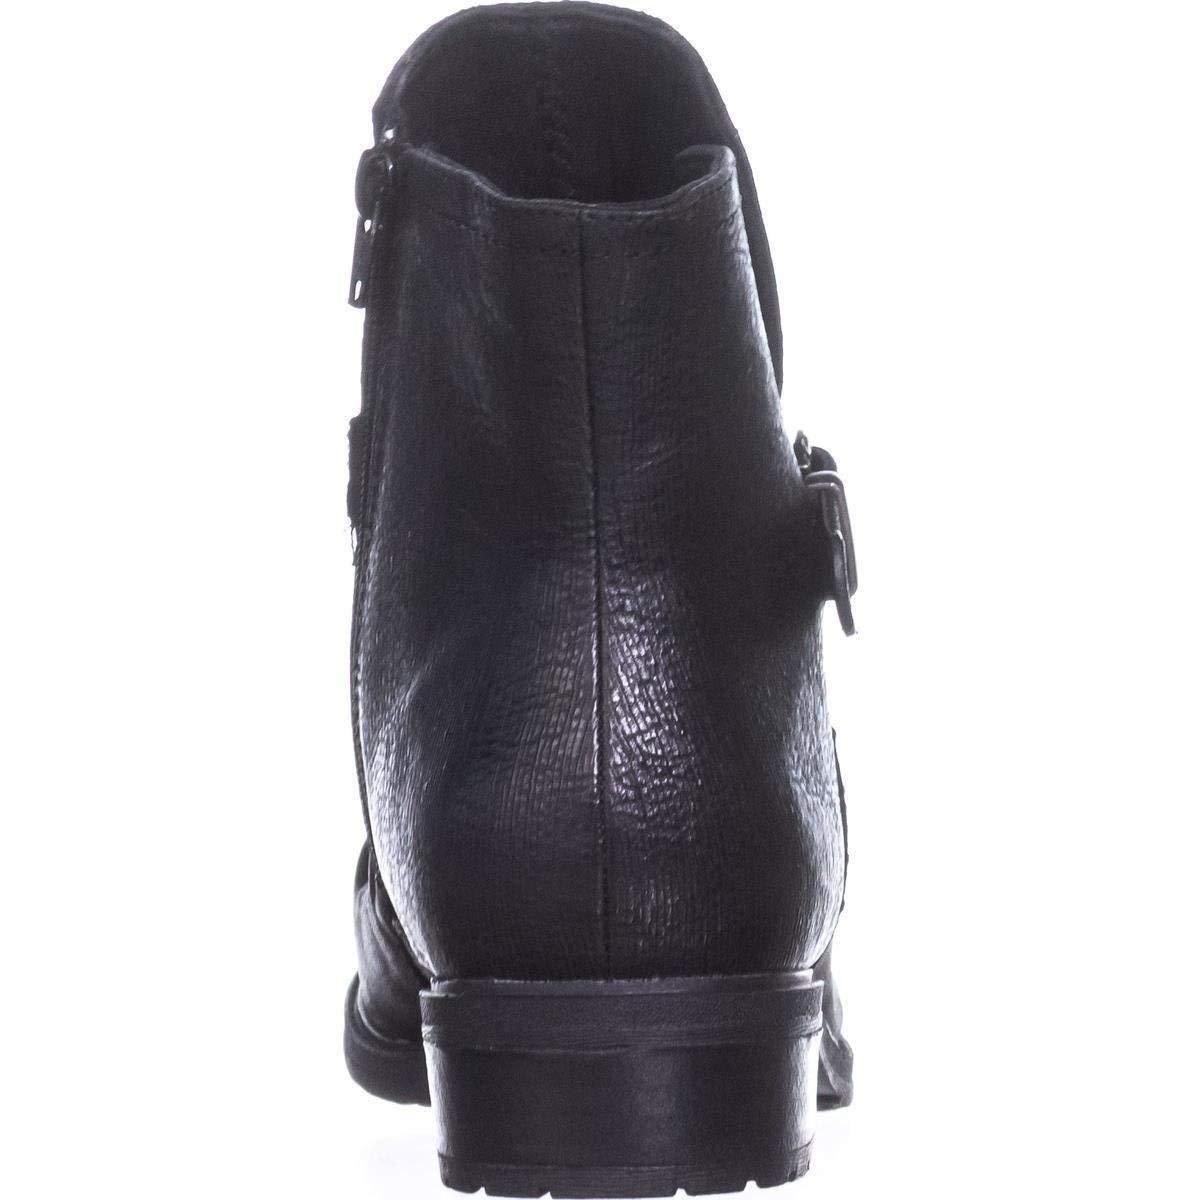 Bare Traps para de mujeres botas al tobillo de para moda de ALMENDRAS TOE ysidora 1ebabf